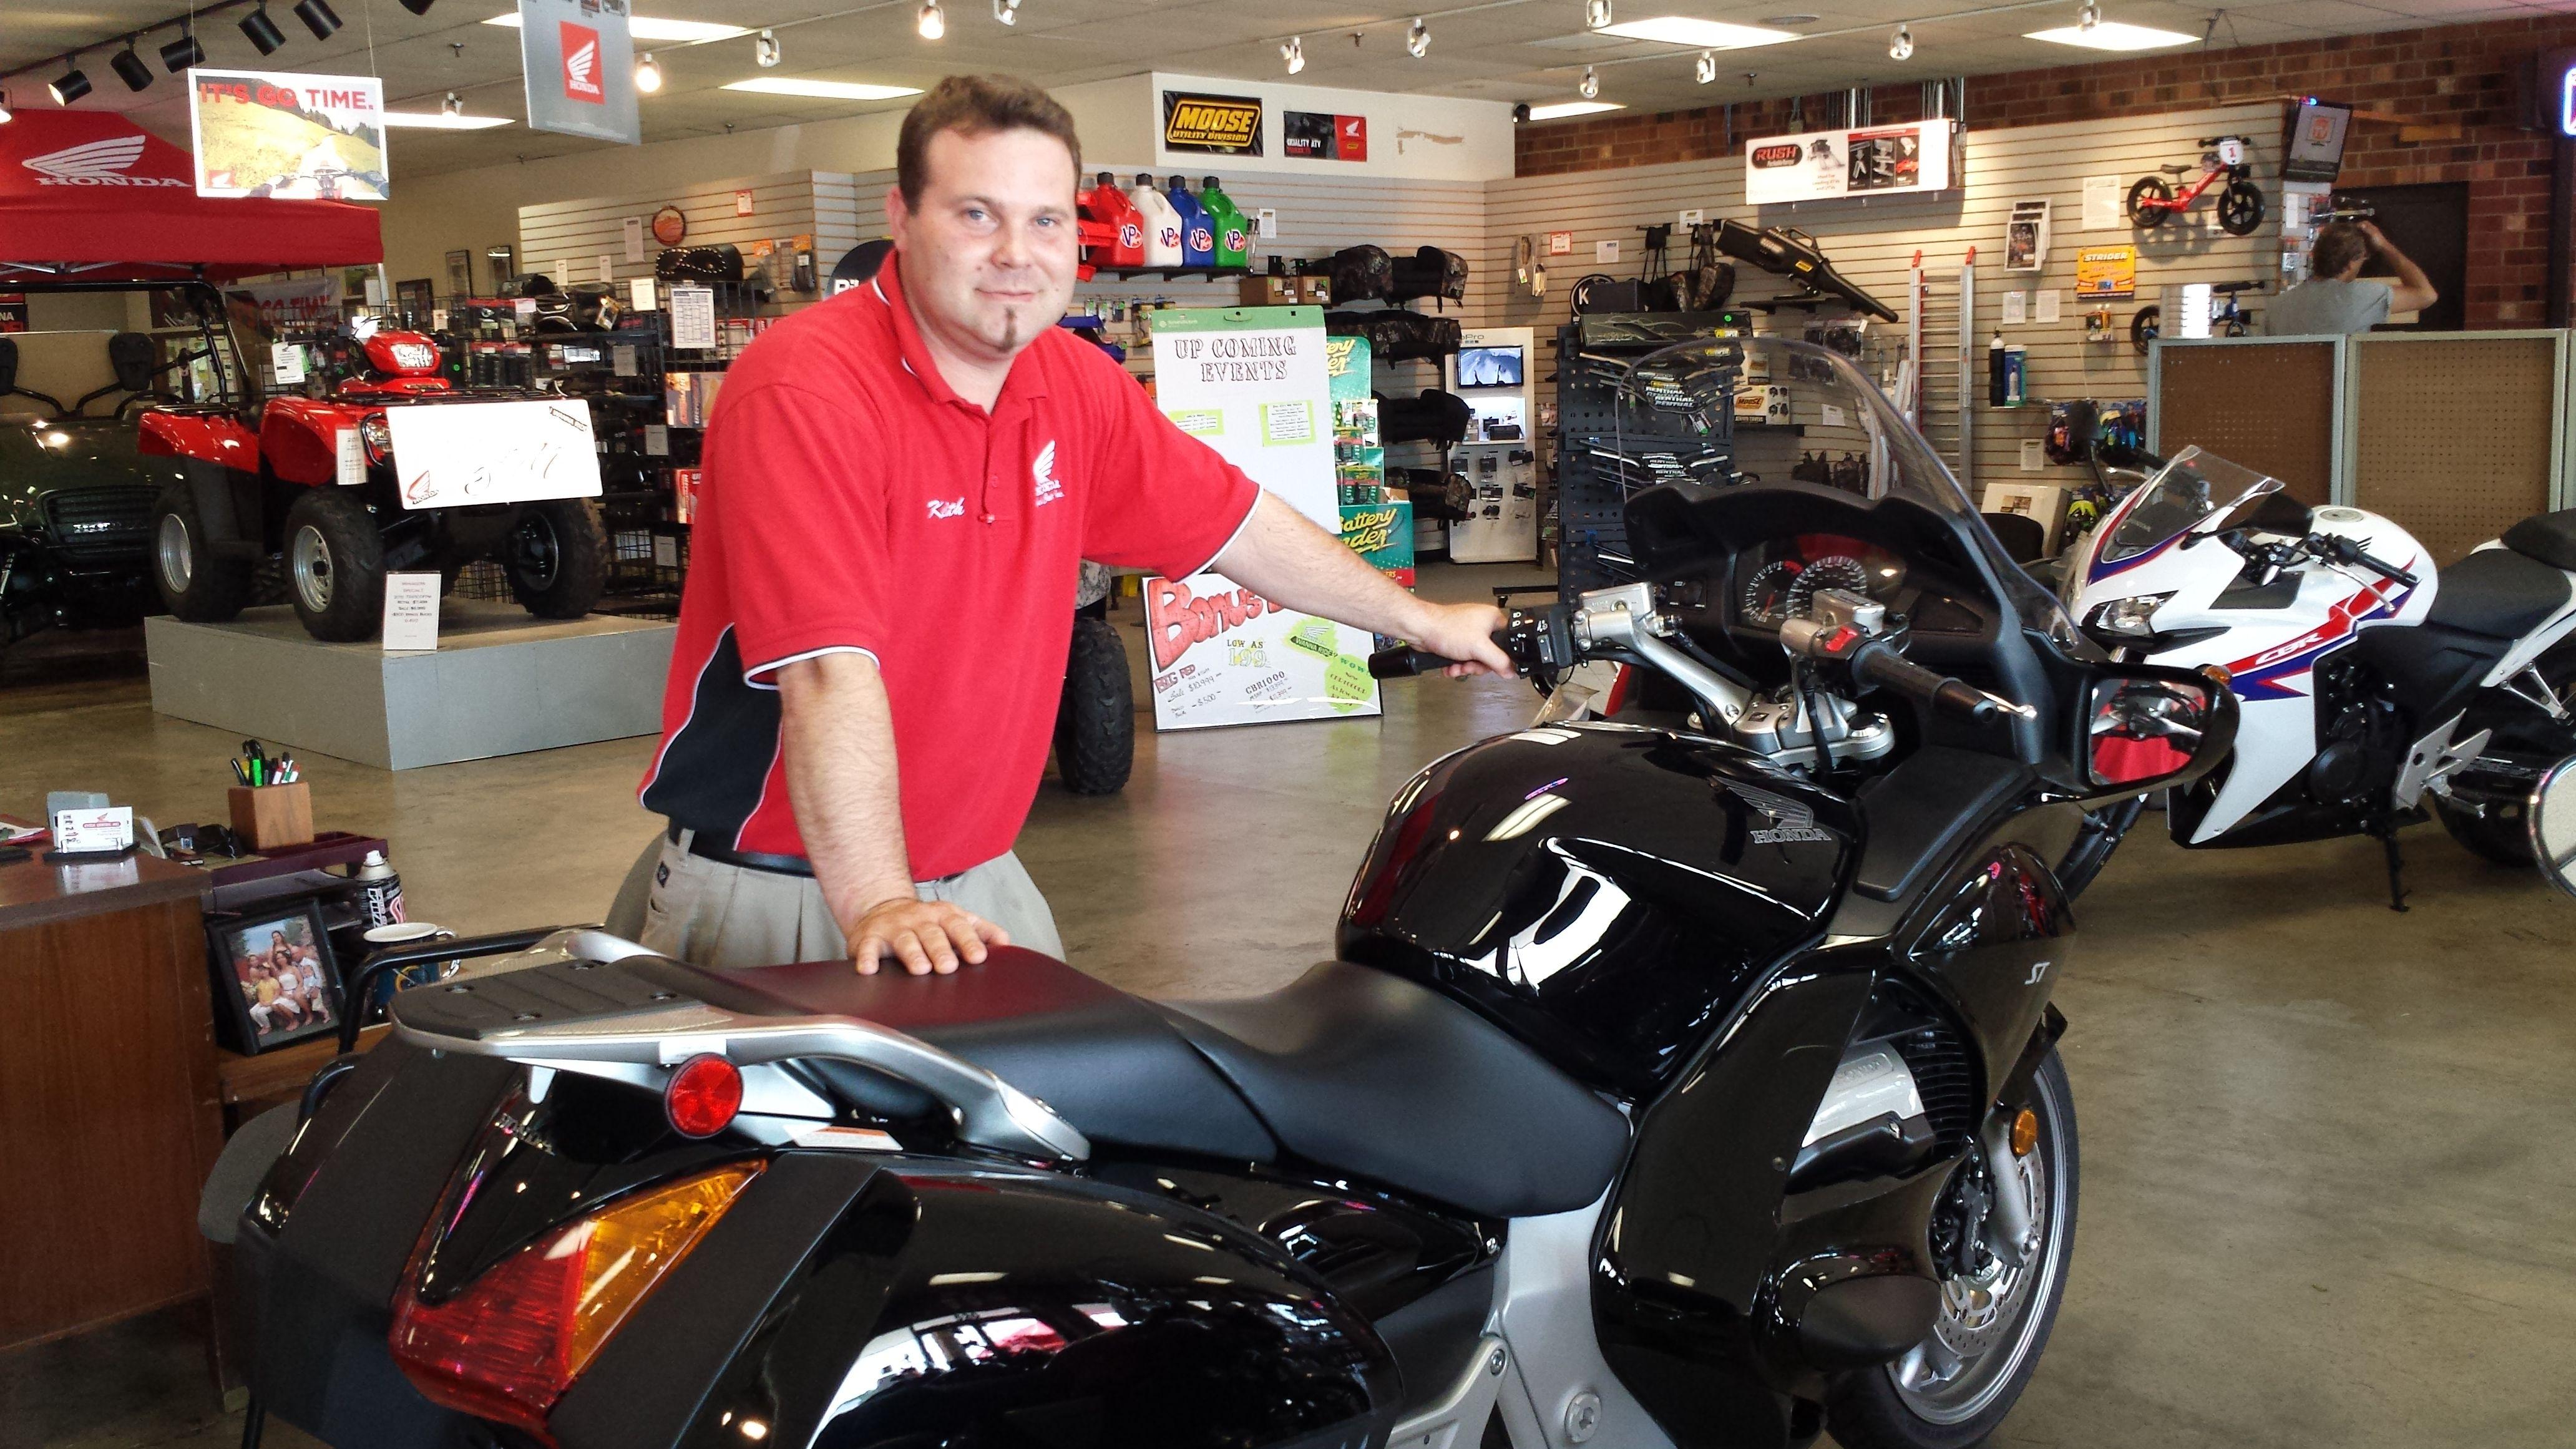 Salesman Keith Showing Off The Latest Honda Bikes Www Cyclecenterinc Com Honda Bikes Honda Bike